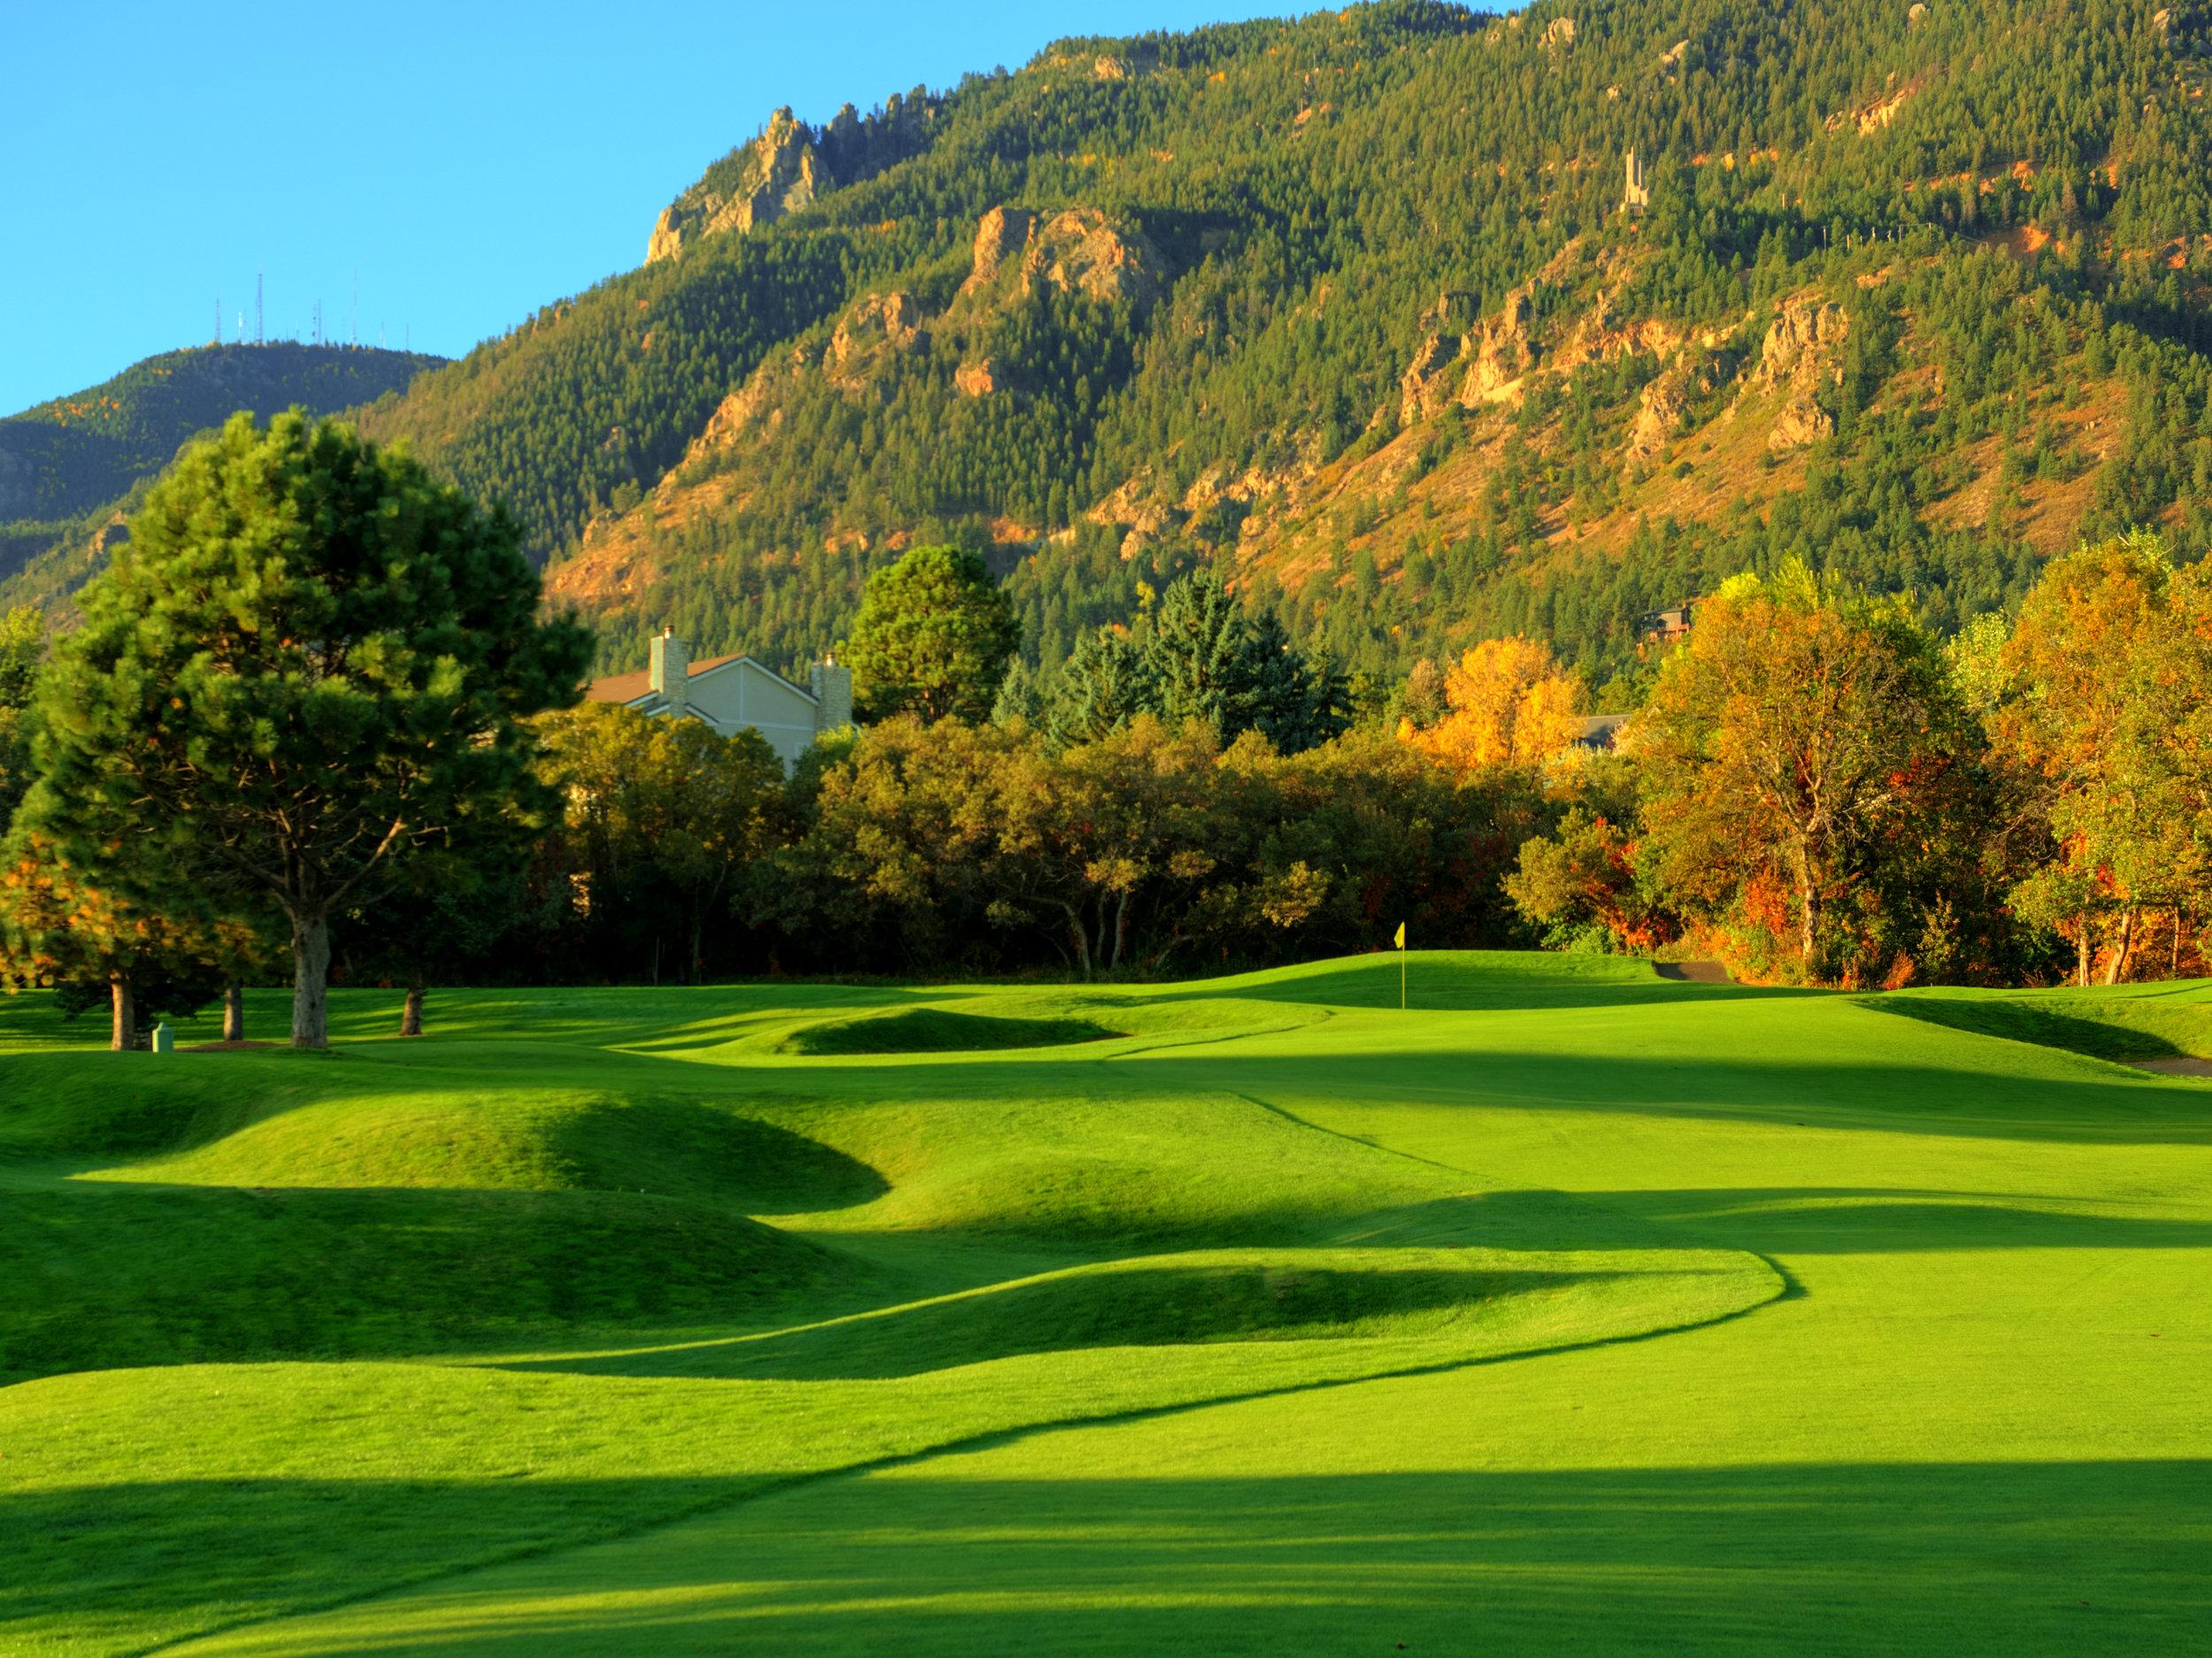 Golf_Courses_West_2.jpg